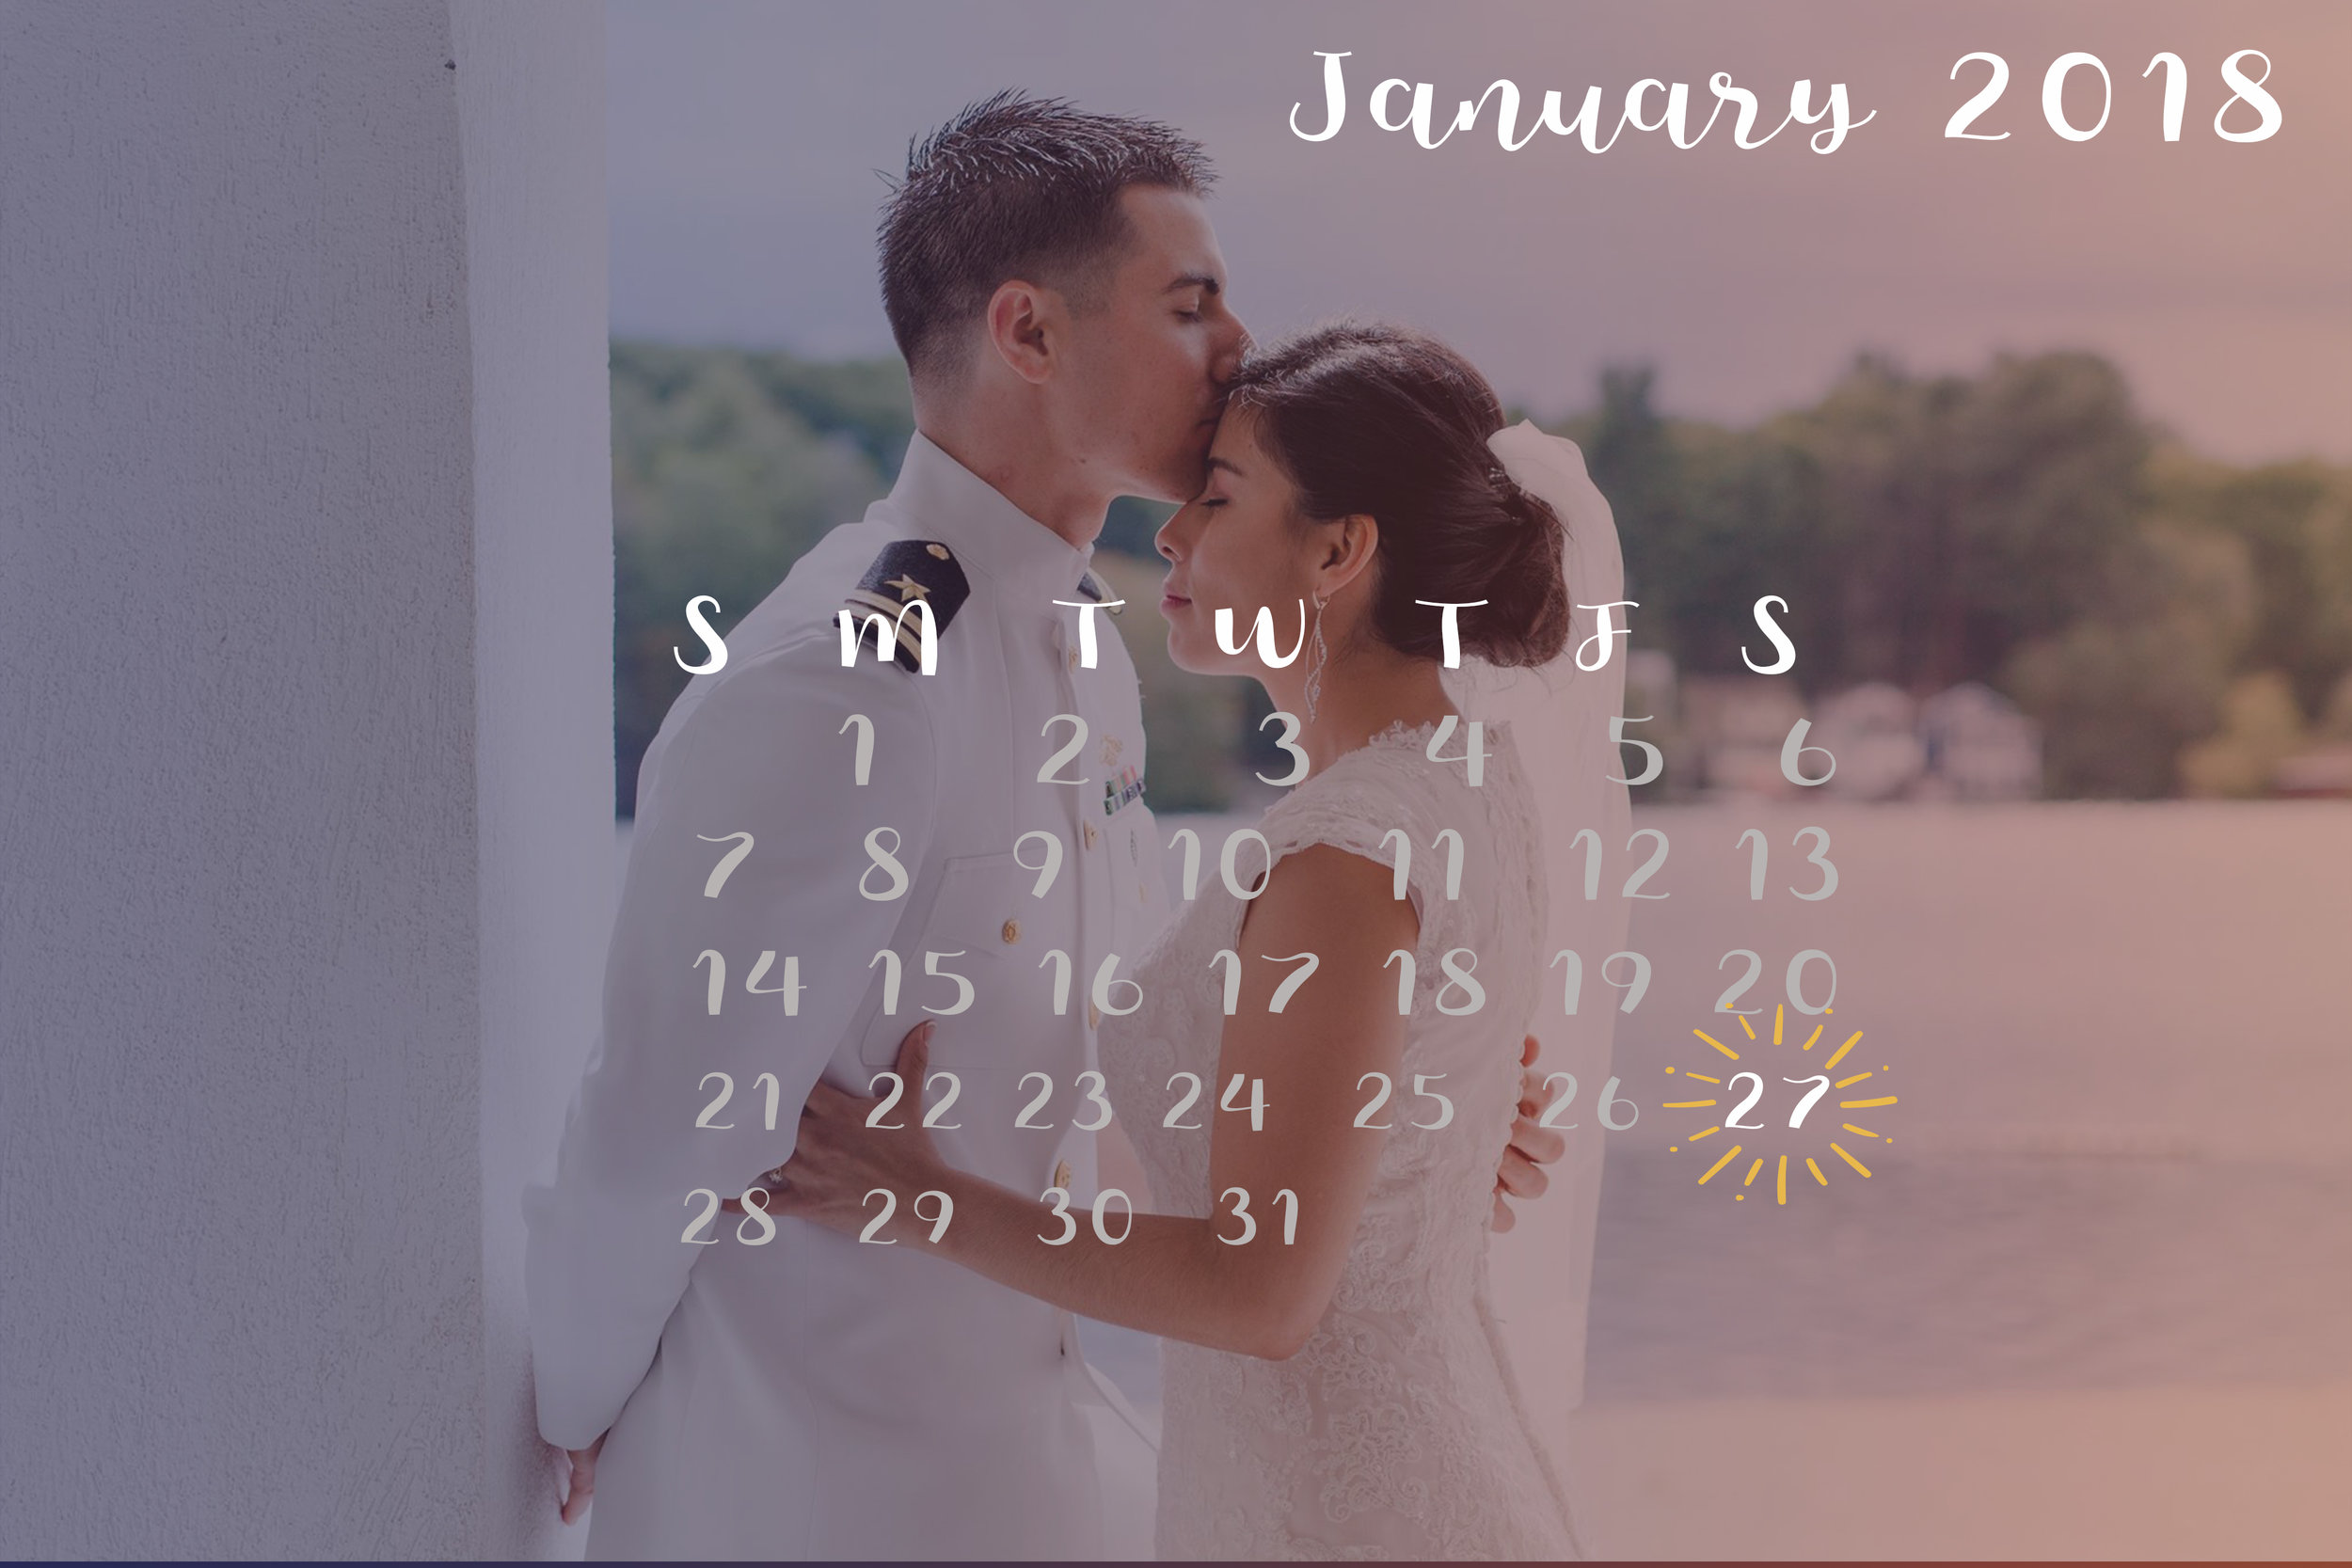 01 - January 2018.jpg